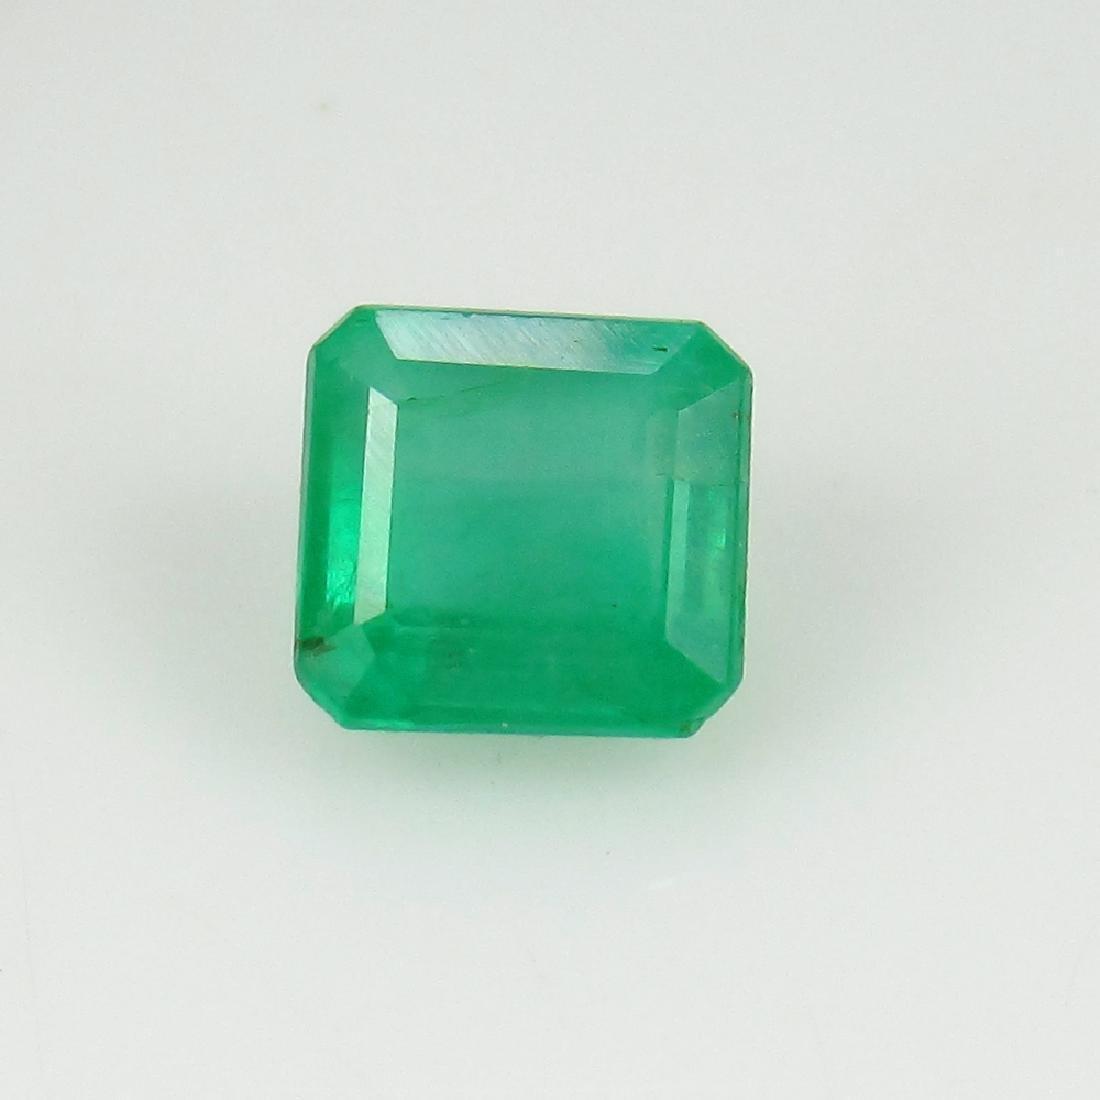 1.56 Ct IGI Certified Genuine Zambian Emerald Excellent